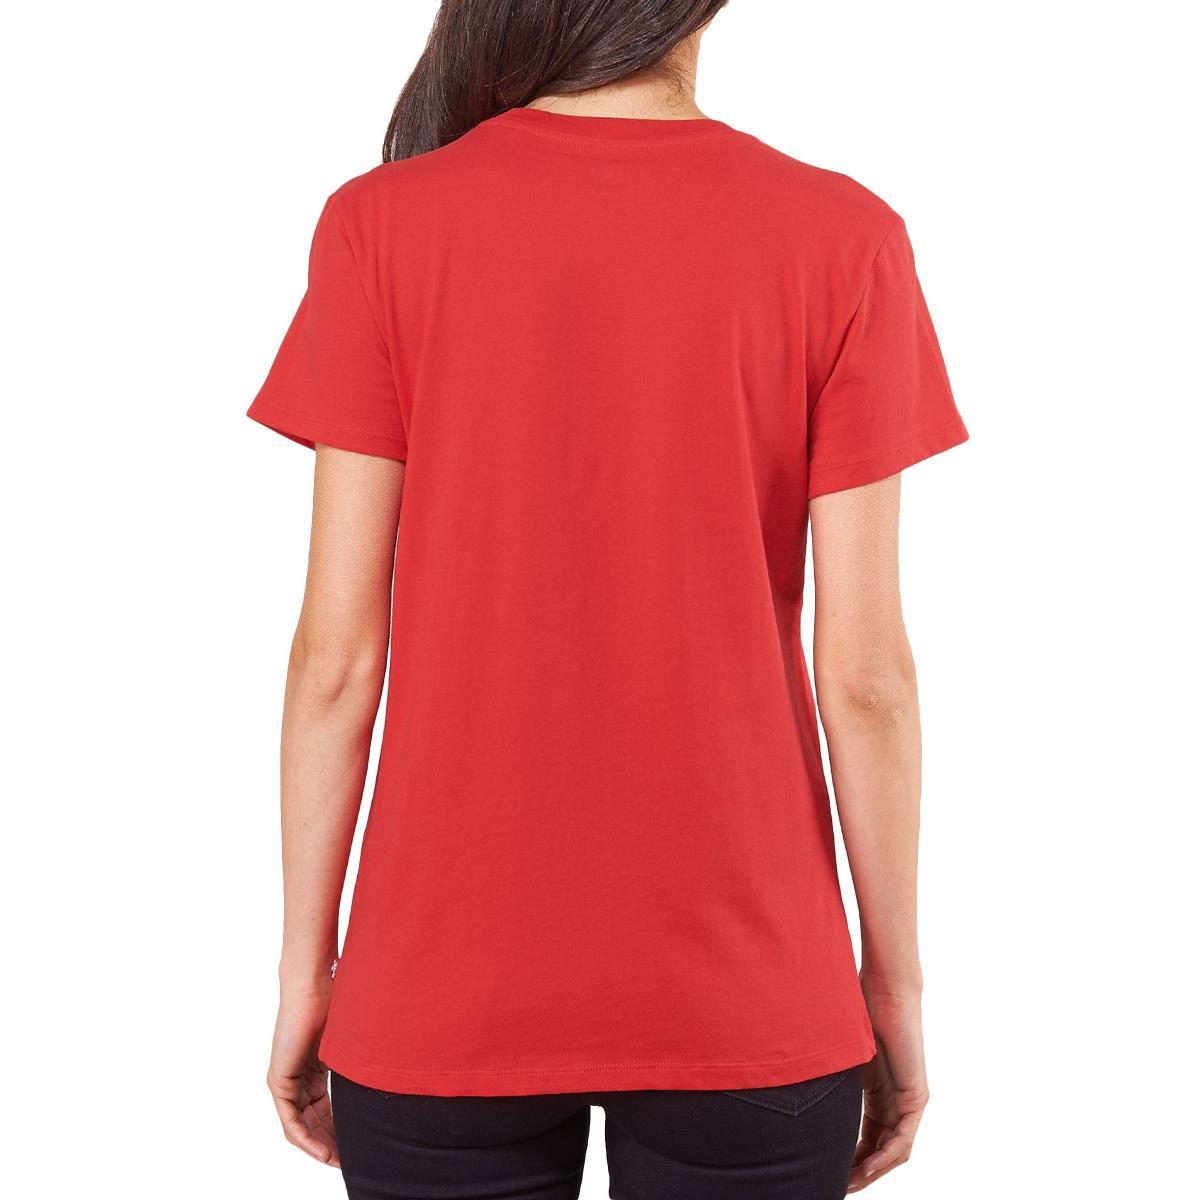 T-shirt Levi's The Perfect Tee con stampa da donna rif. 17369-0621